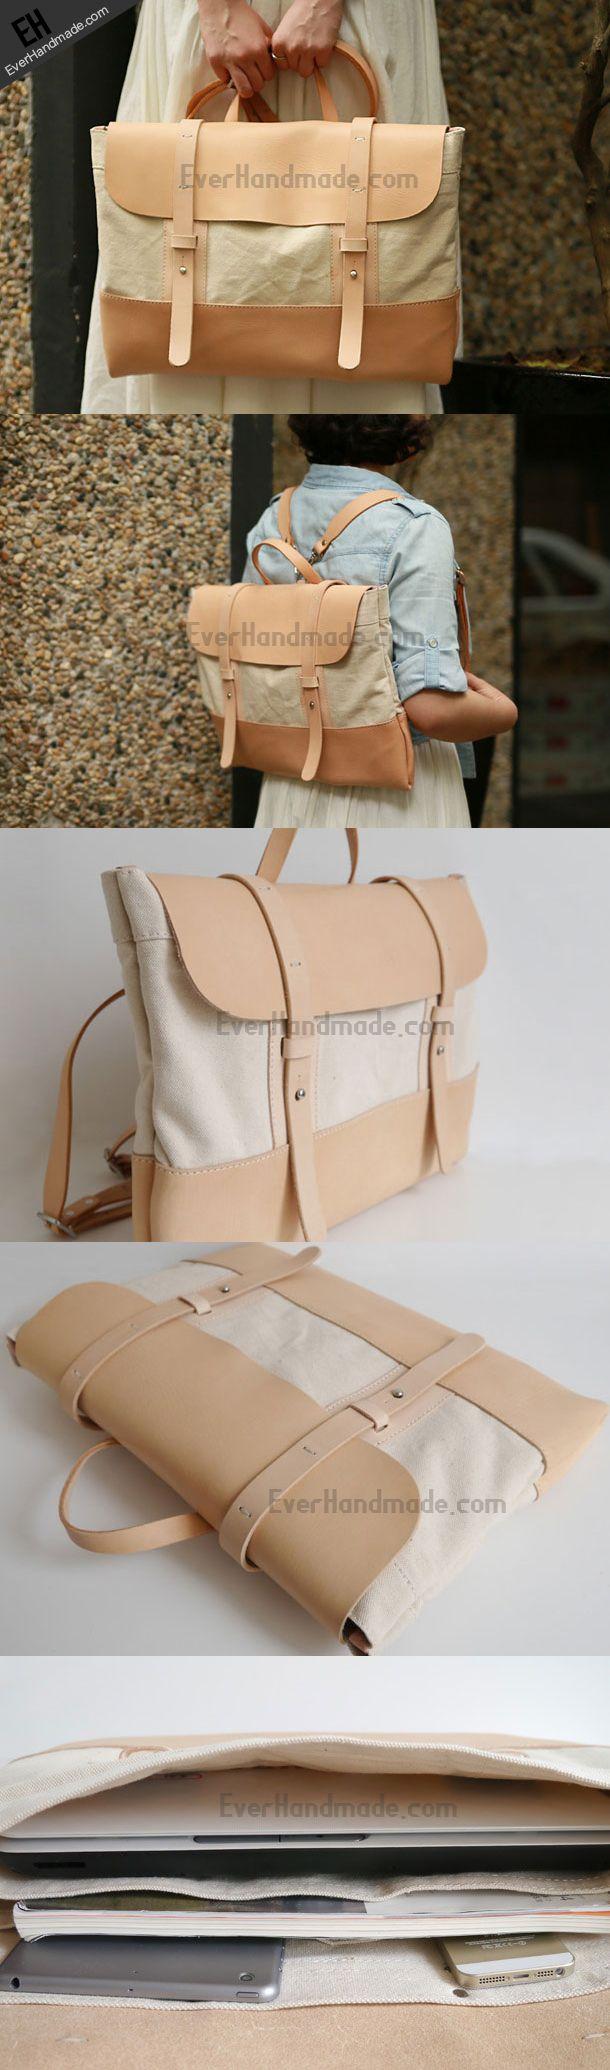 Handmade Leather messenger bag backpack canvas for